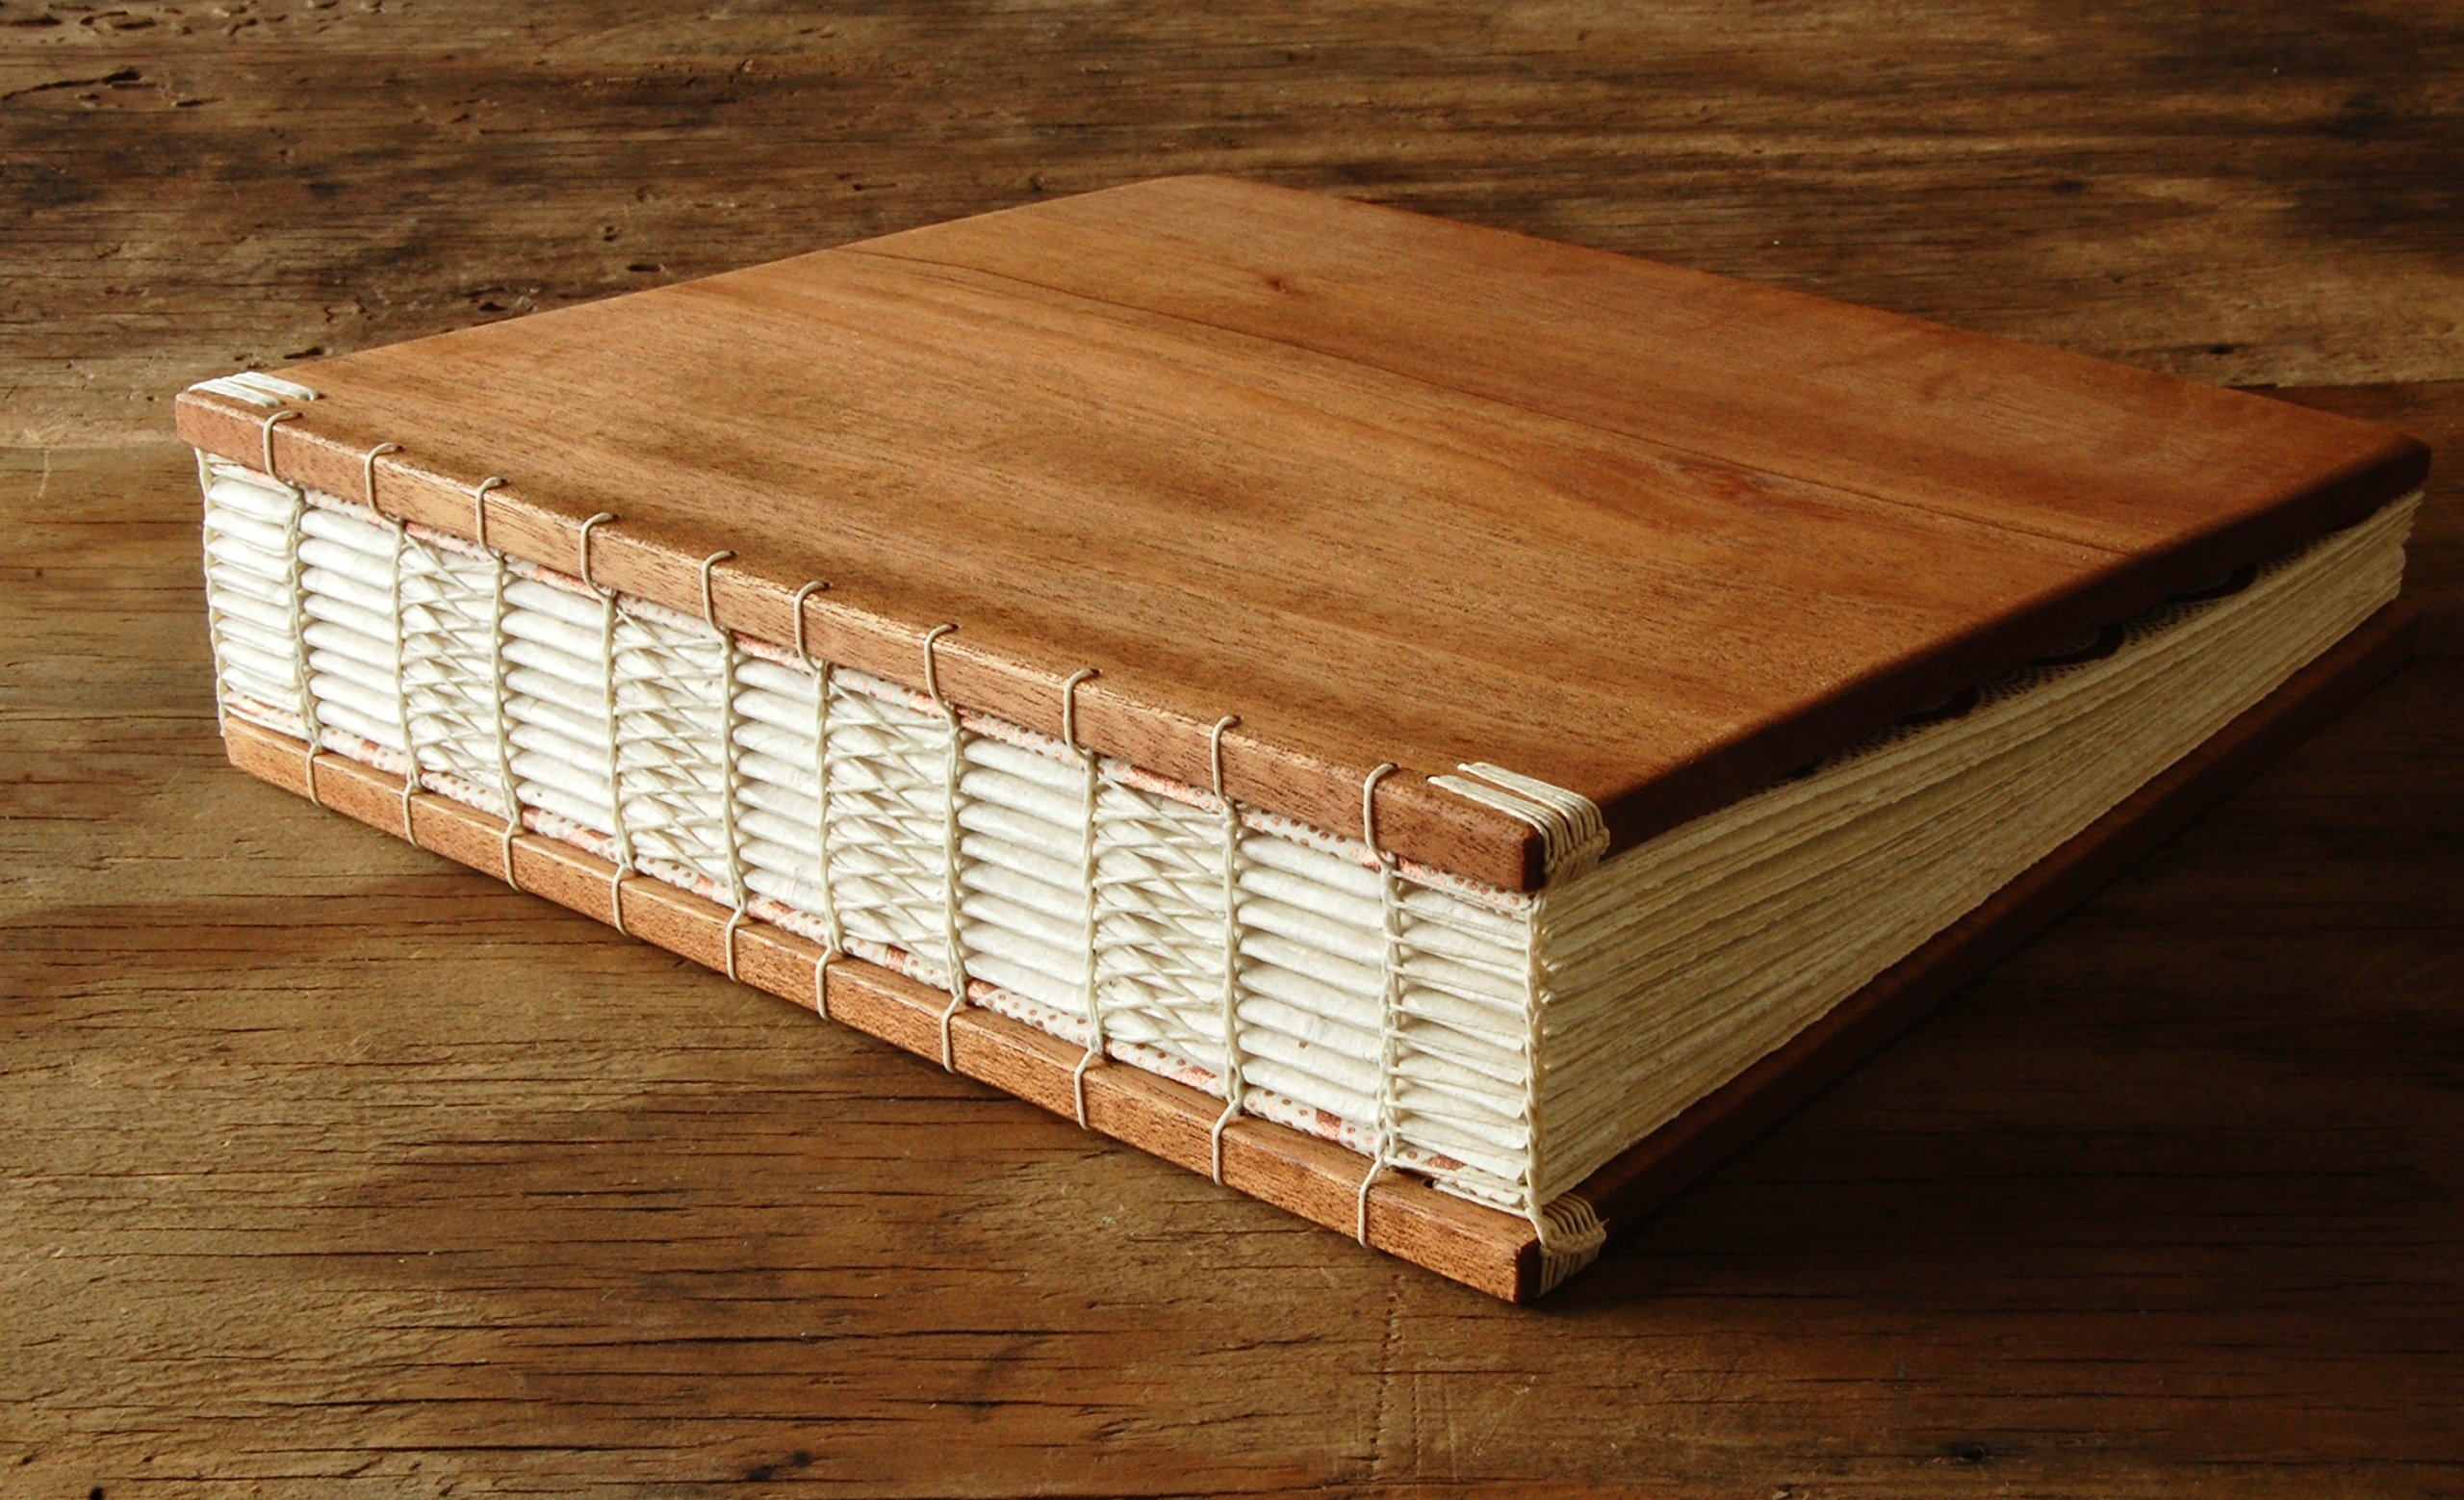 Handmade Instant Photo Wedding Guest Book or Scrapbook - Mahogany Wood